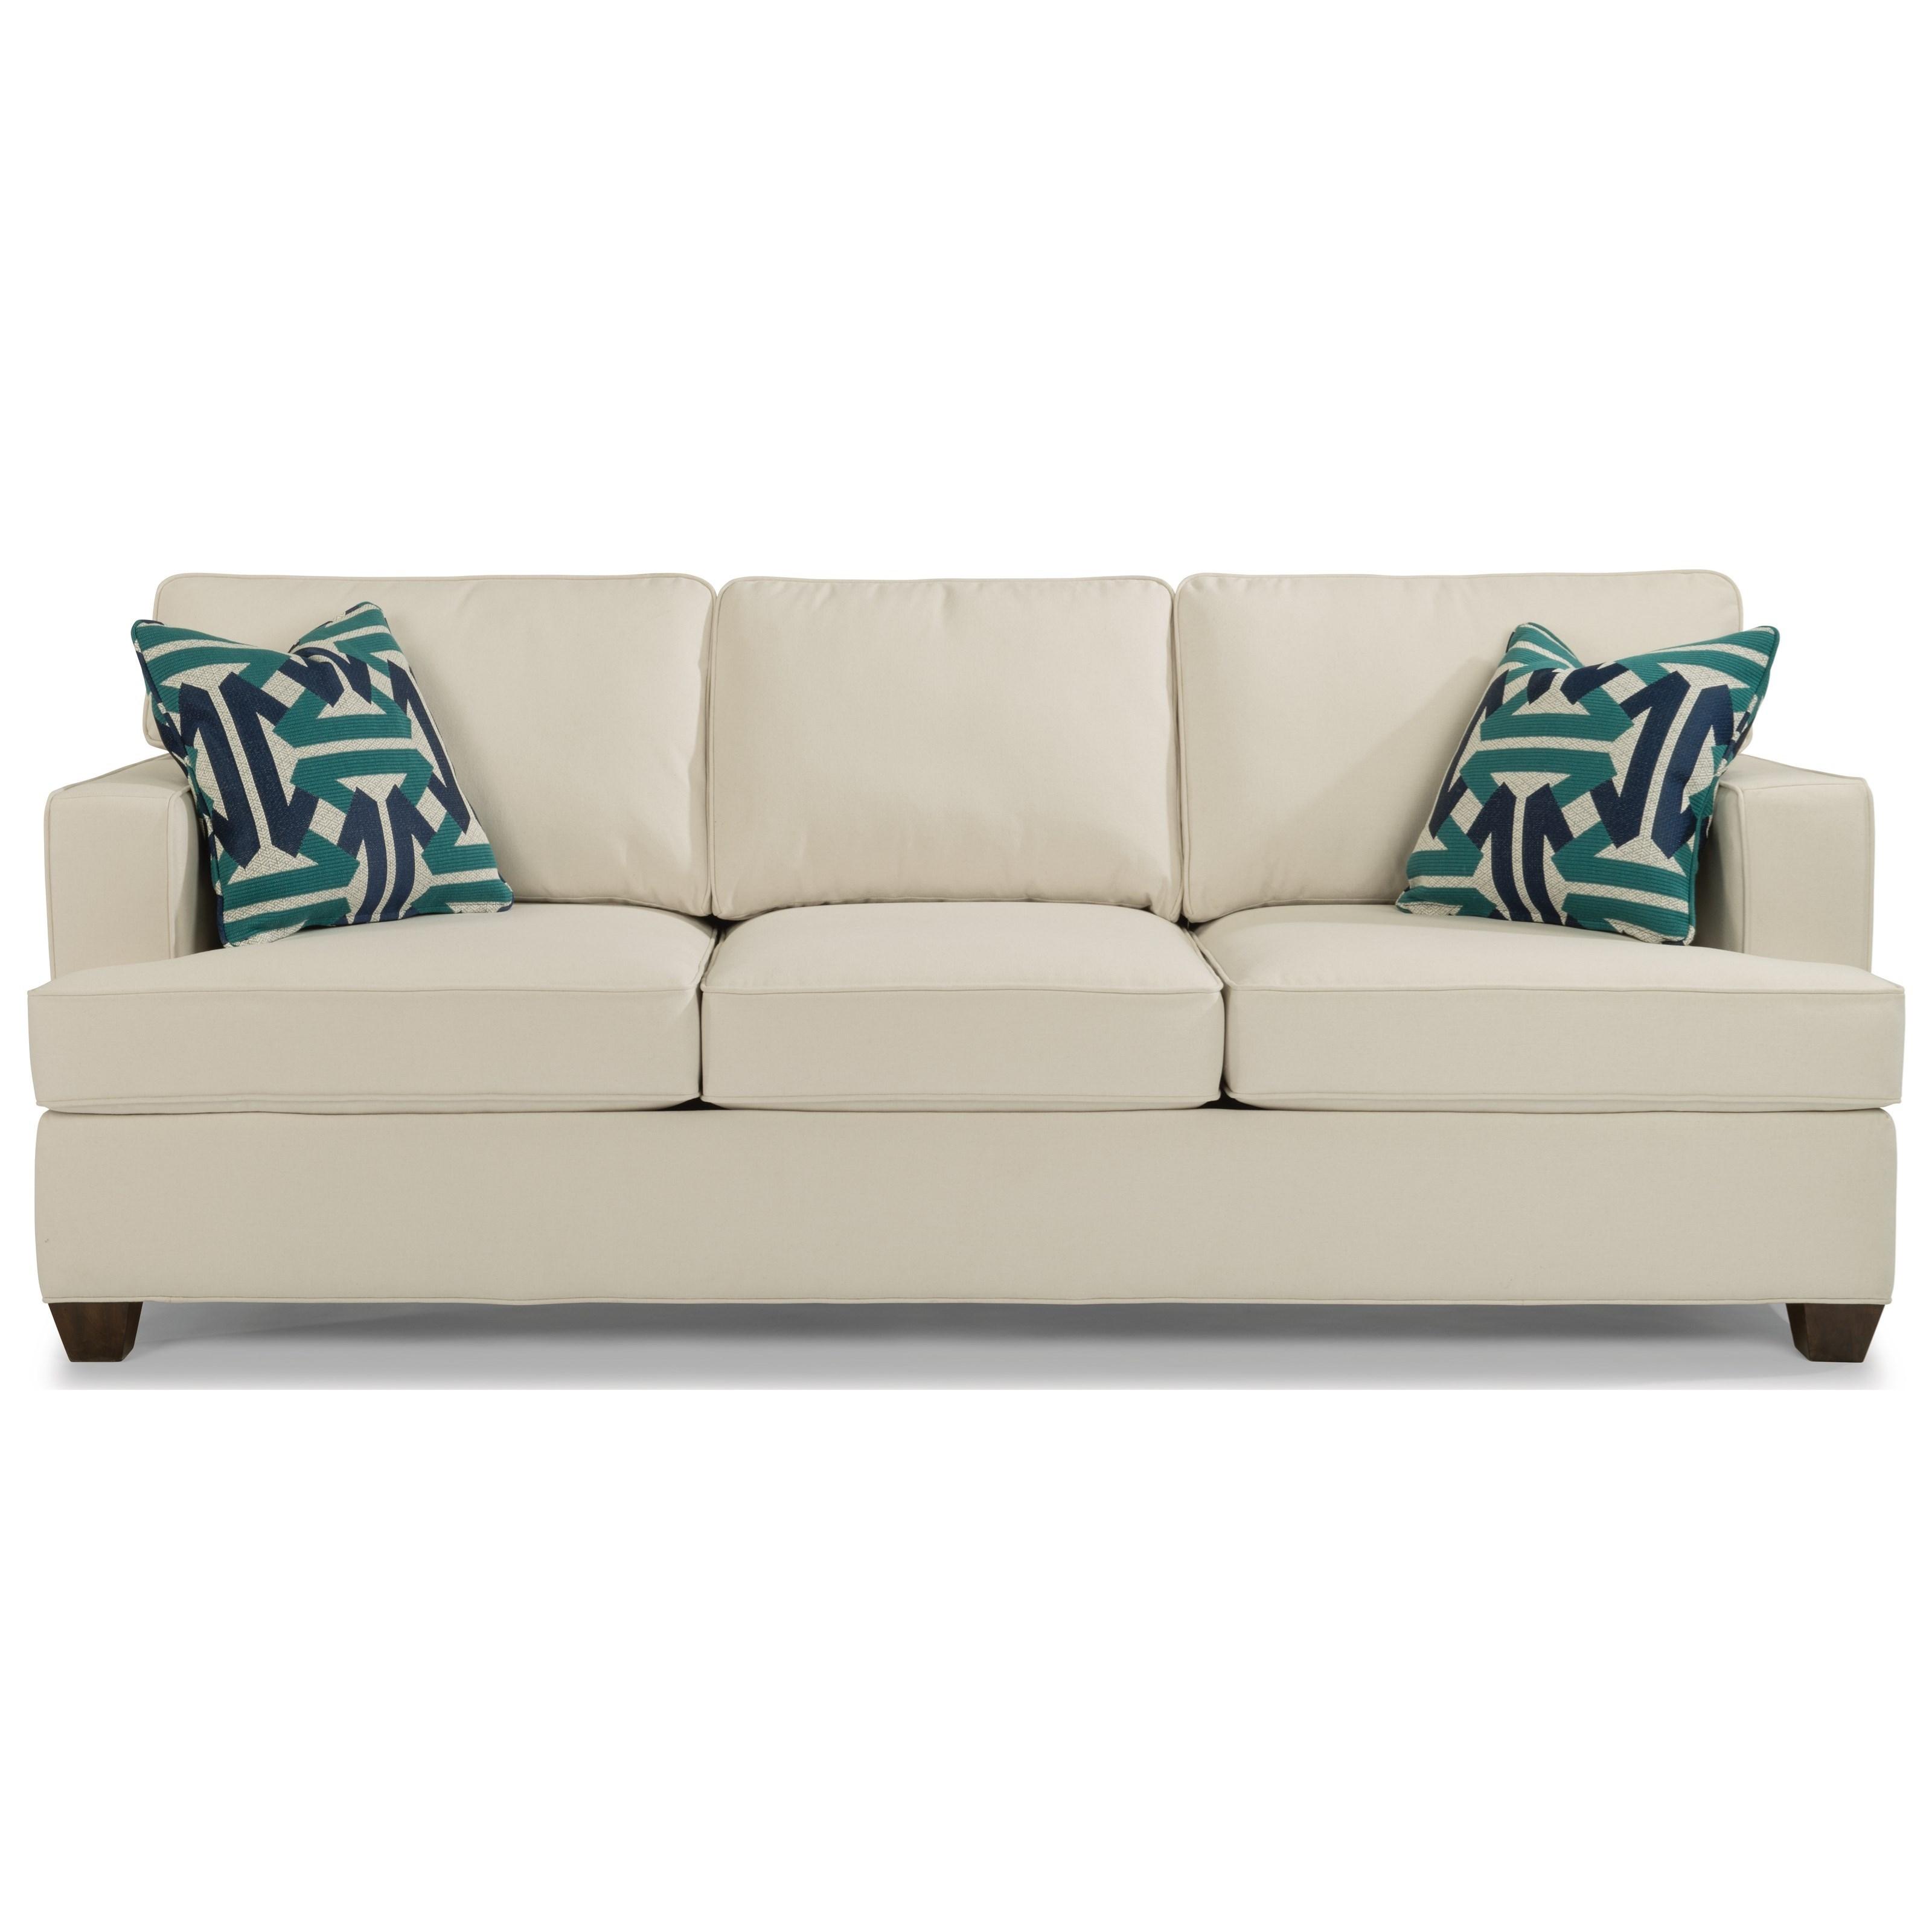 Flexsteel Furniture Telephone Number: Flexsteel Pierce Contemporary Sofa With Track Arms